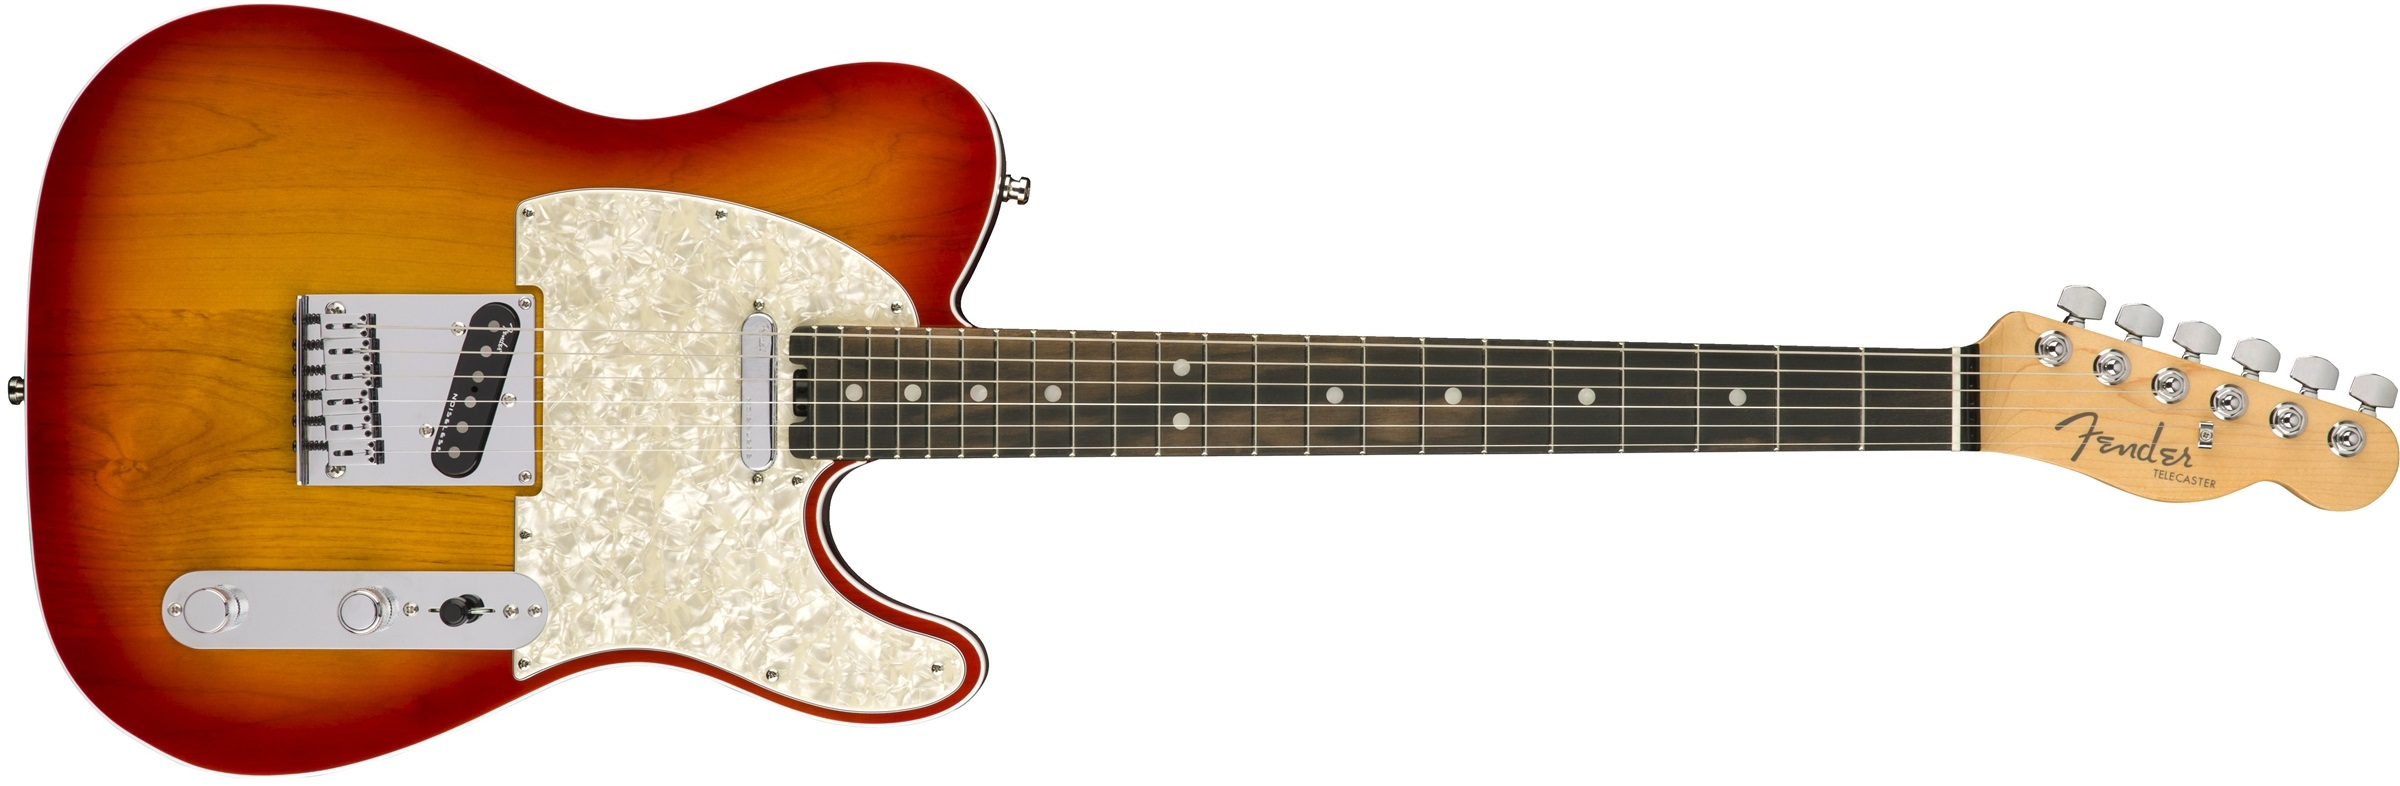 Fender American Elite Telecaster EB ACB